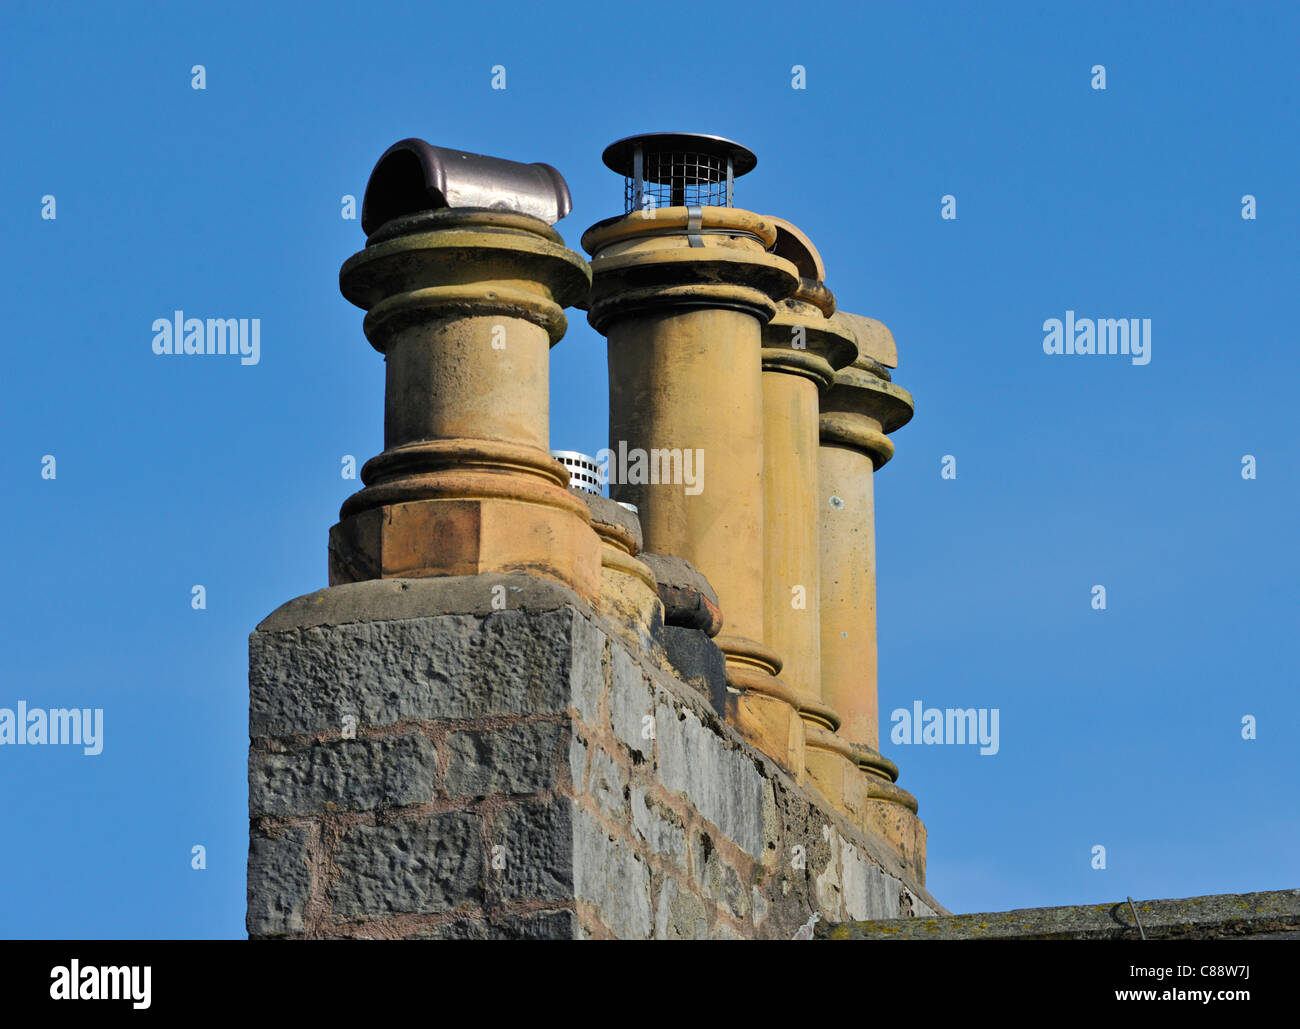 Four chimney pots. Fellside, Kendal, Cumbria, England, United Kingdom, Europe. - Stock Image